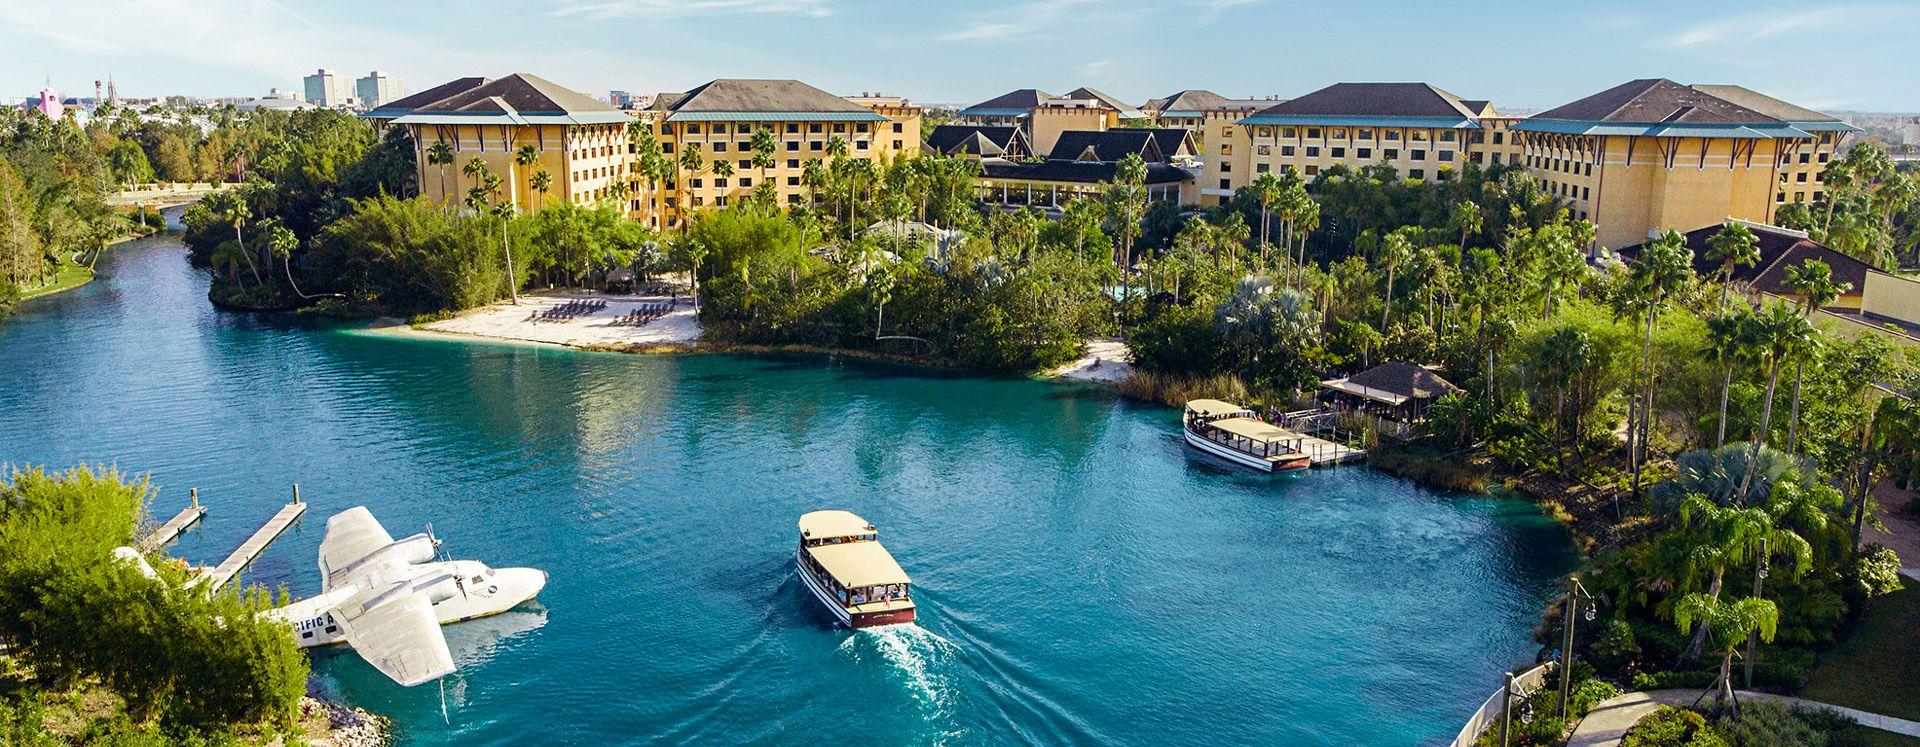 Water taxi transporting guests to Loews Royal Pacific Resort at Universal Orlando™.